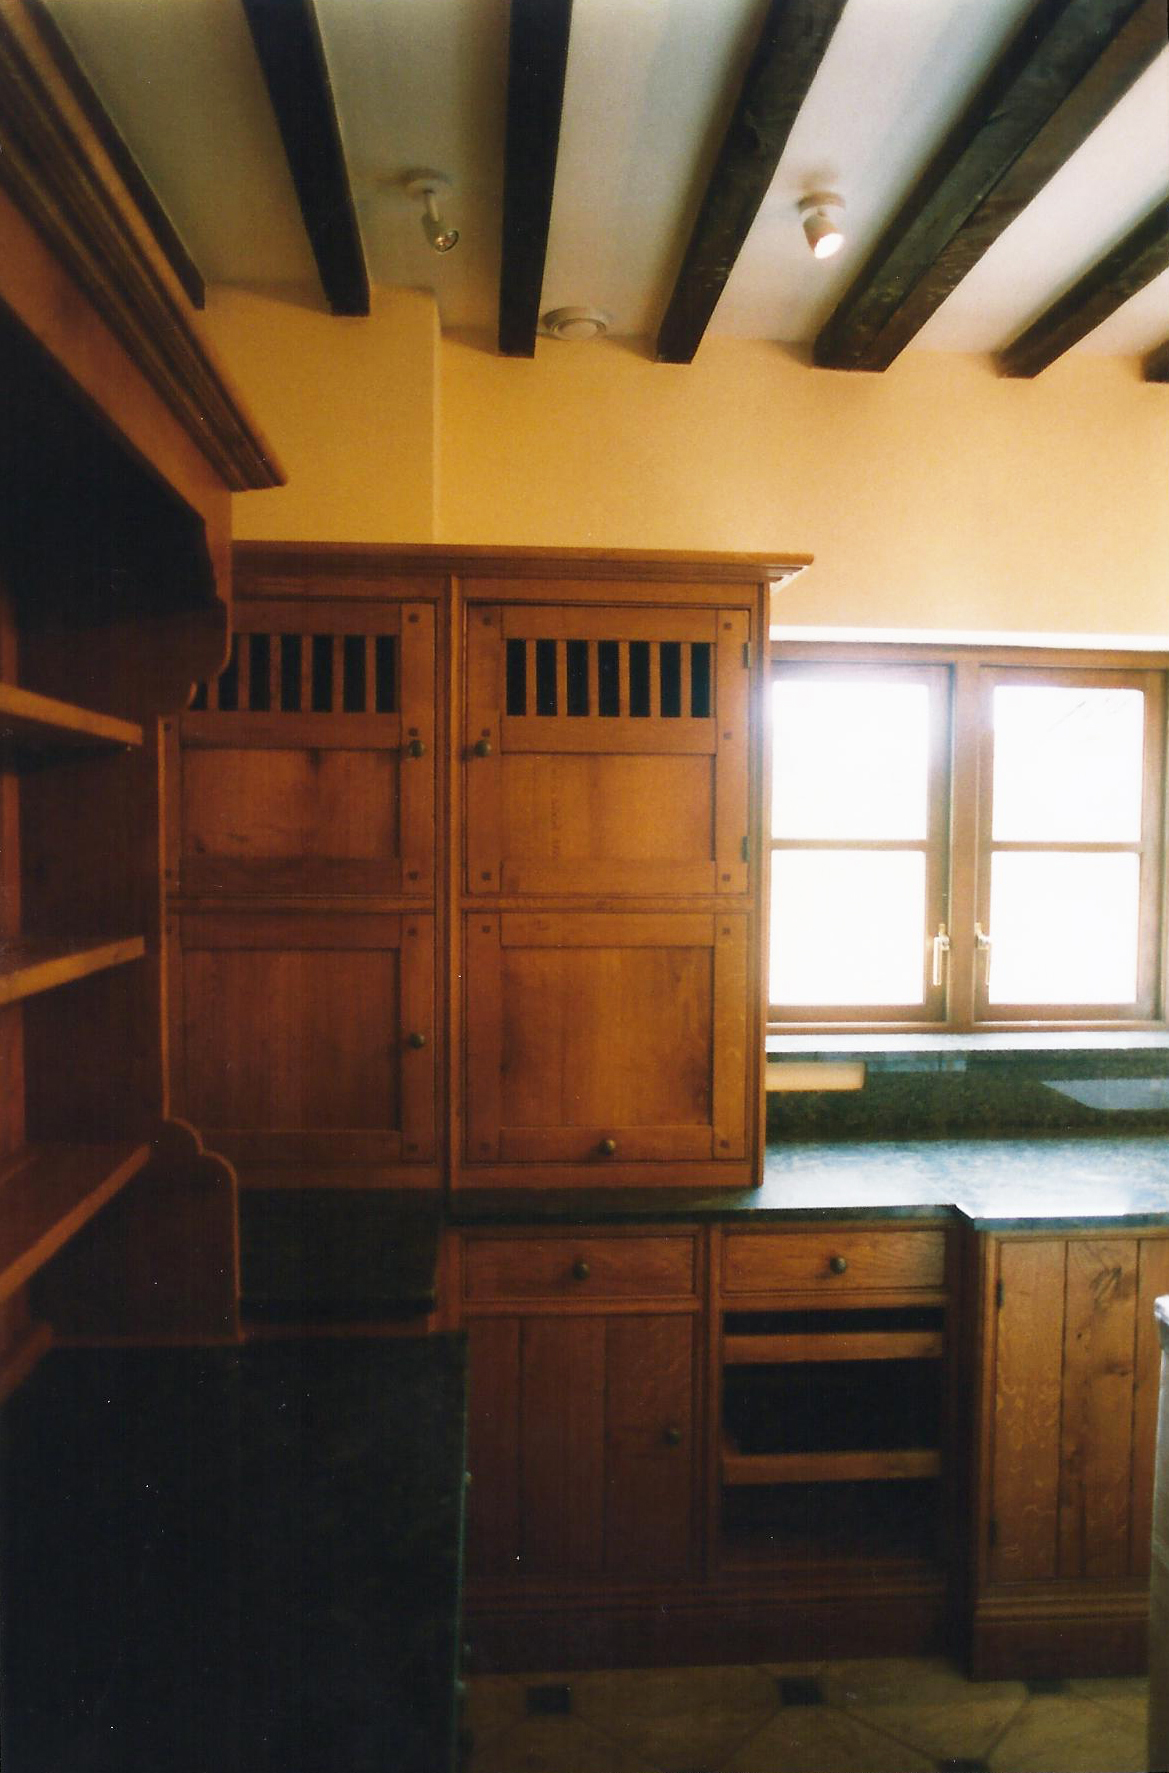 Kitchen Image 3 - North End Farm - East Yorkshire Architects - Samuel Kendall Associates